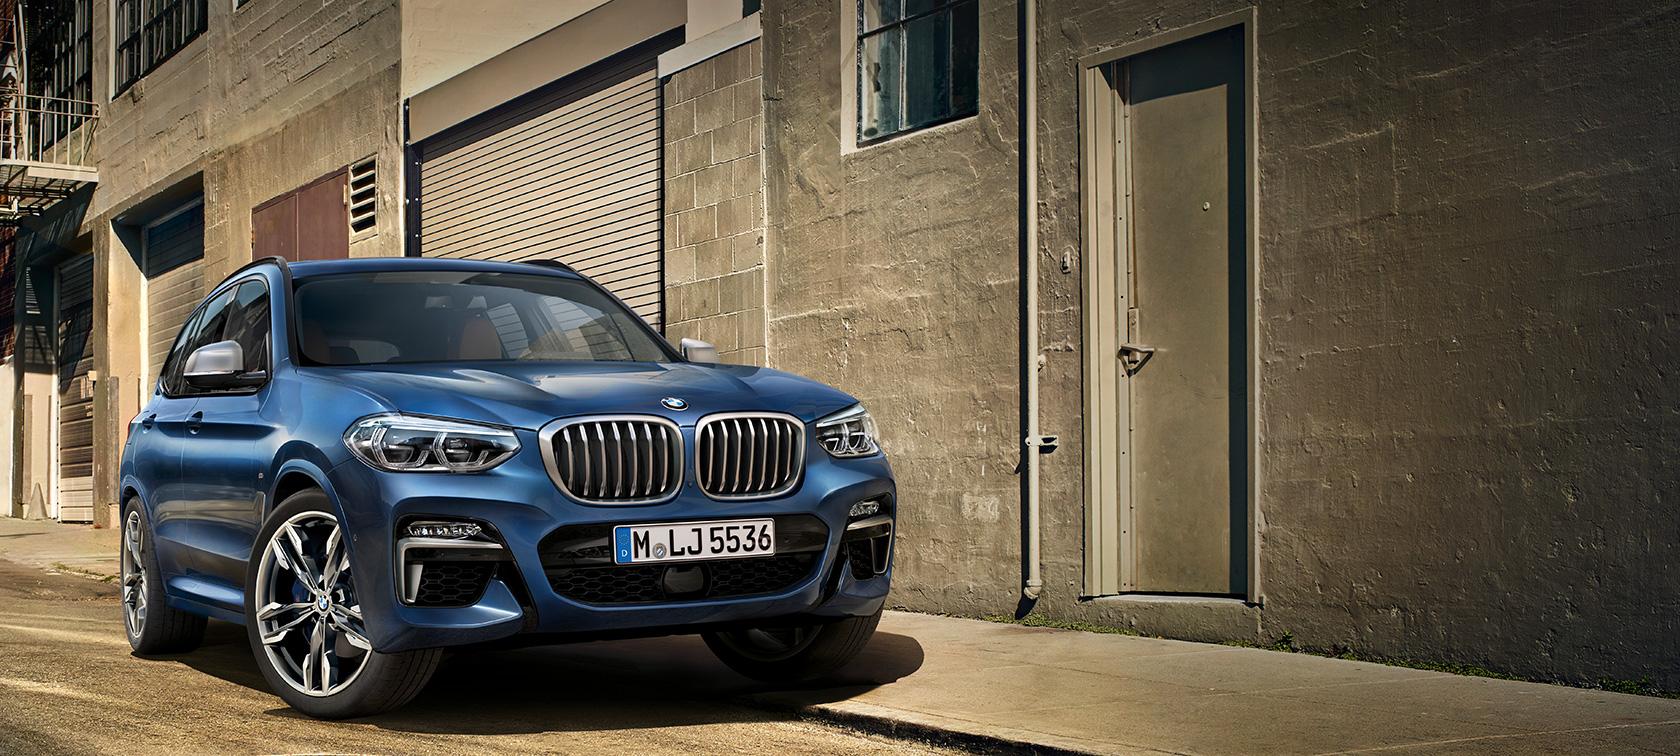 BMW X3: all details, equipment and technical data | BMW com au